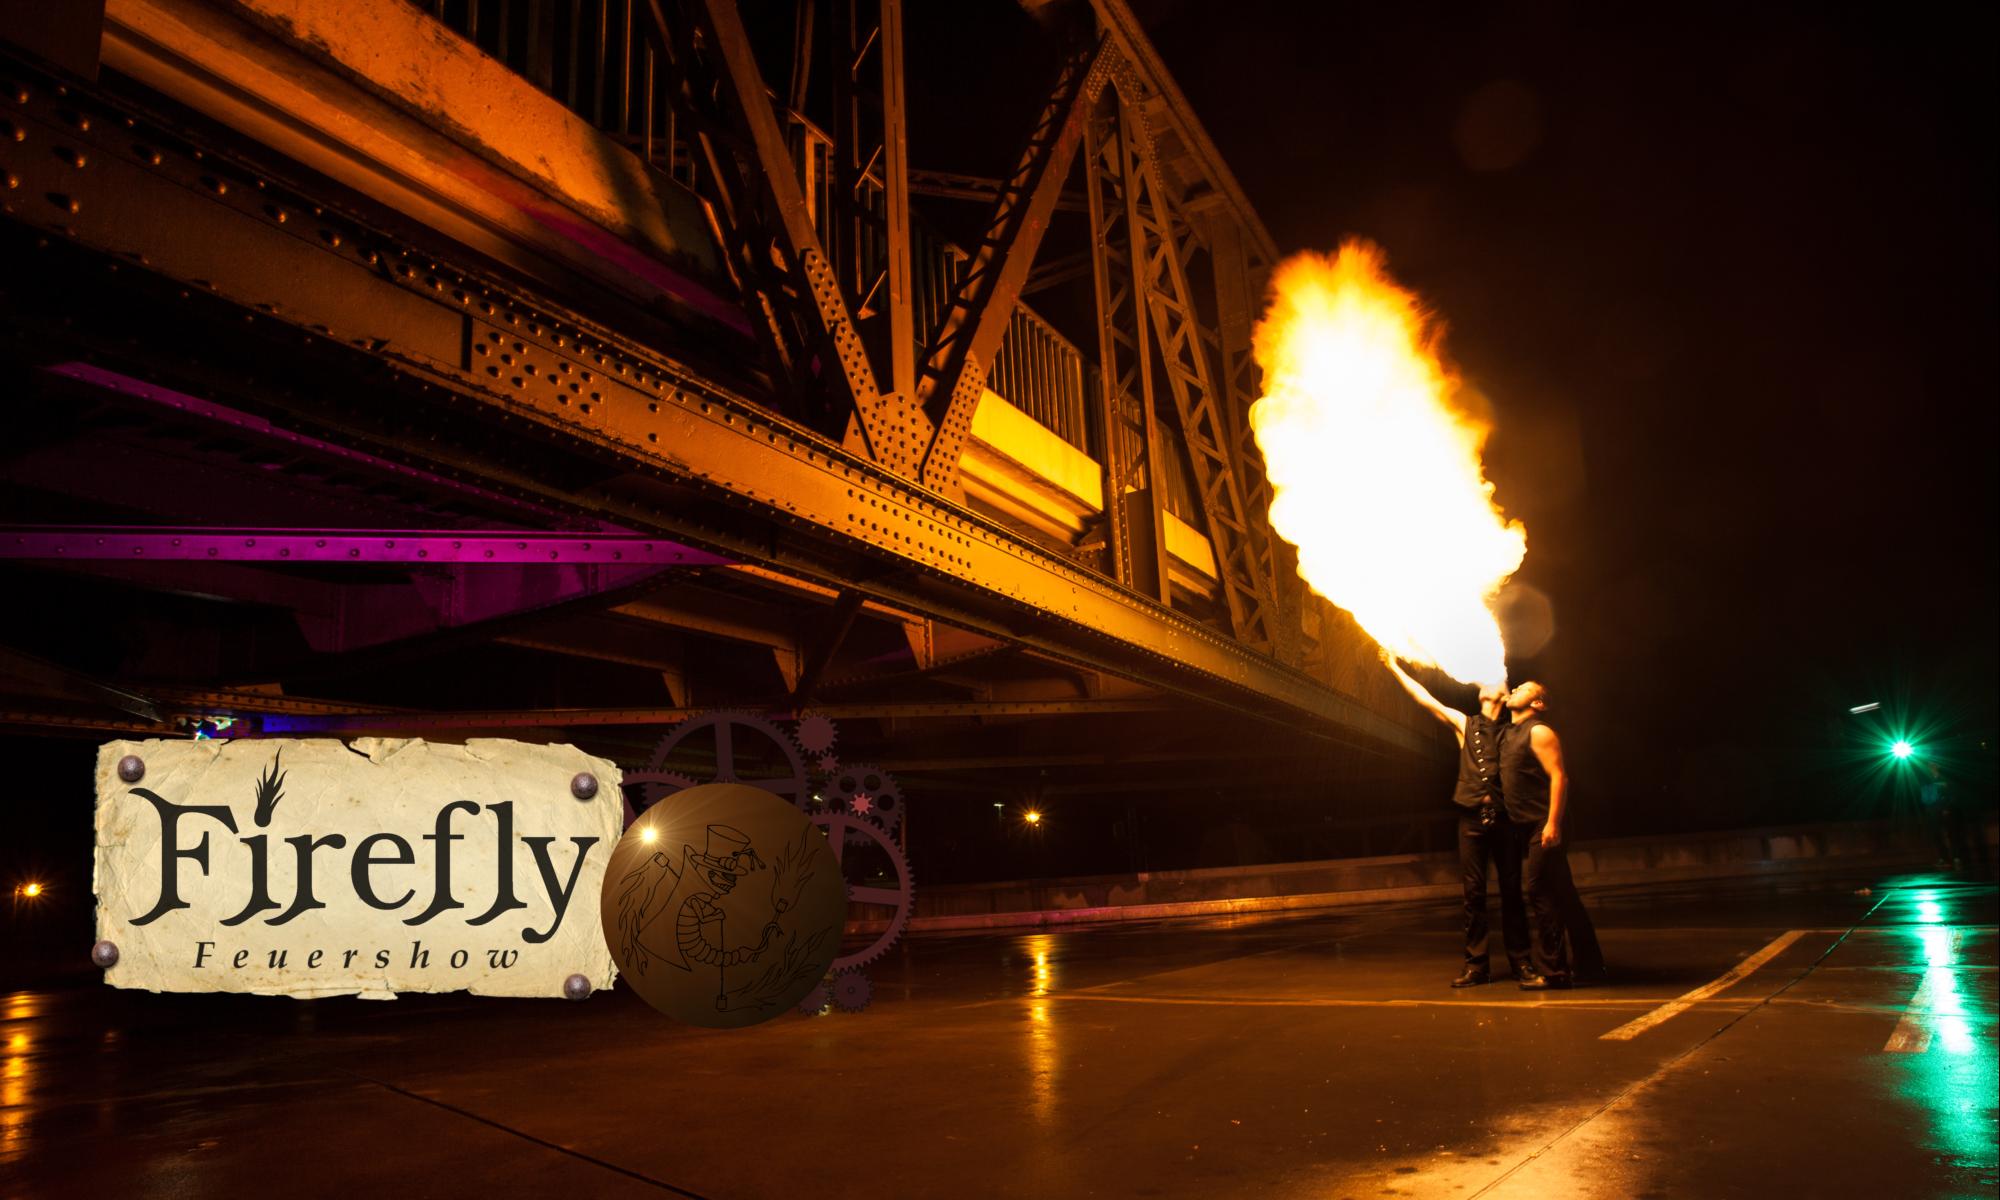 Firefly Feuershow